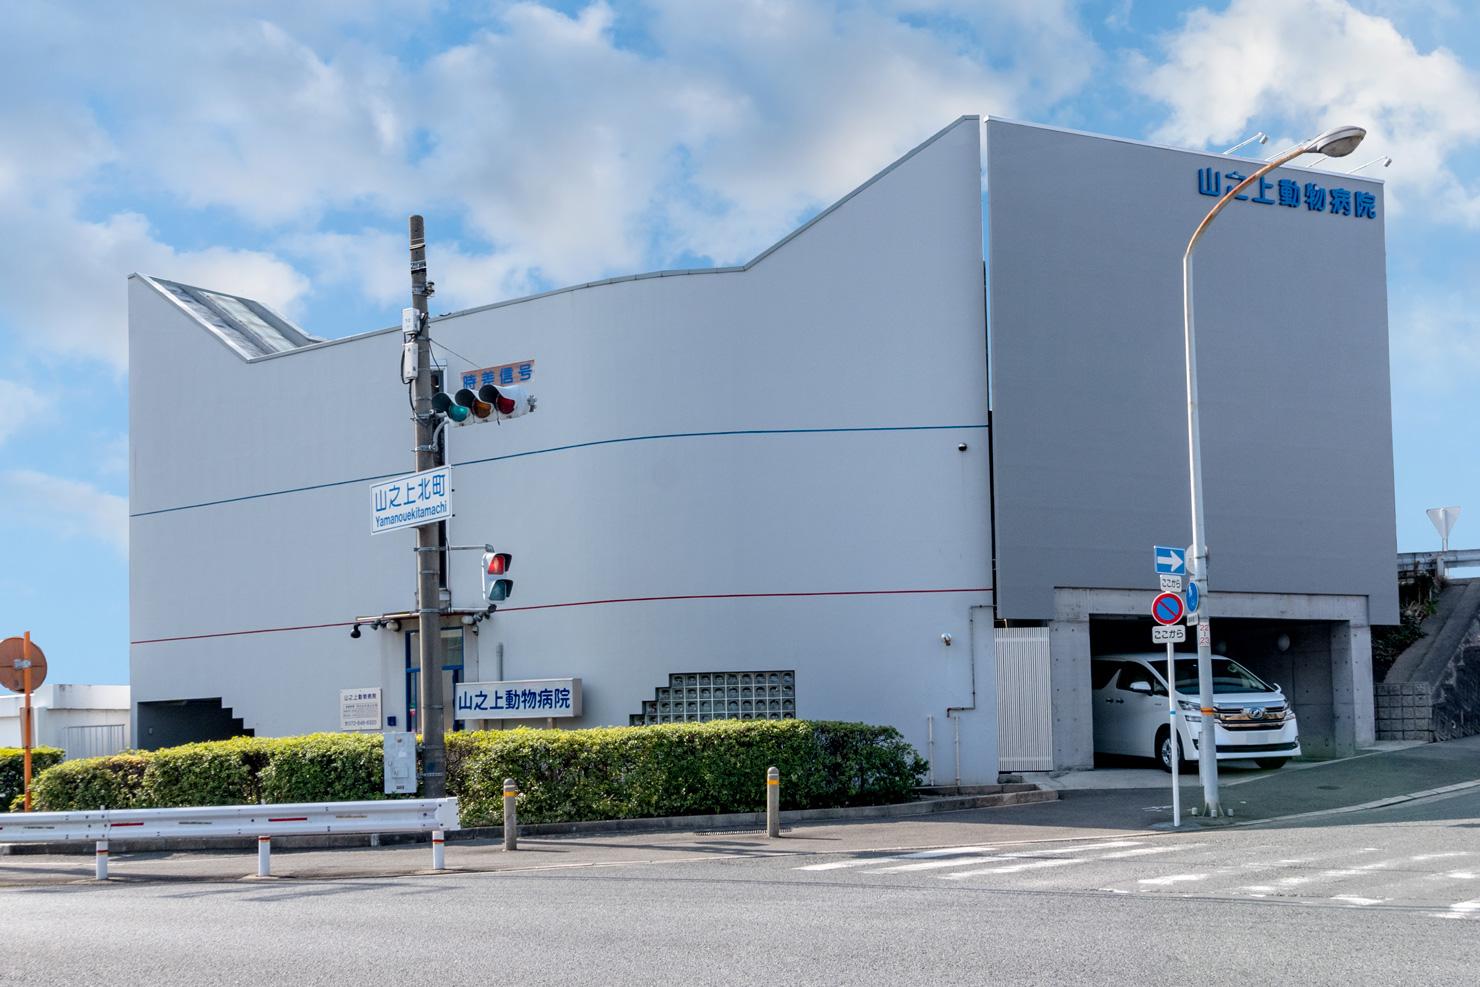 枚方の山之上動物病院:外観・駐車場